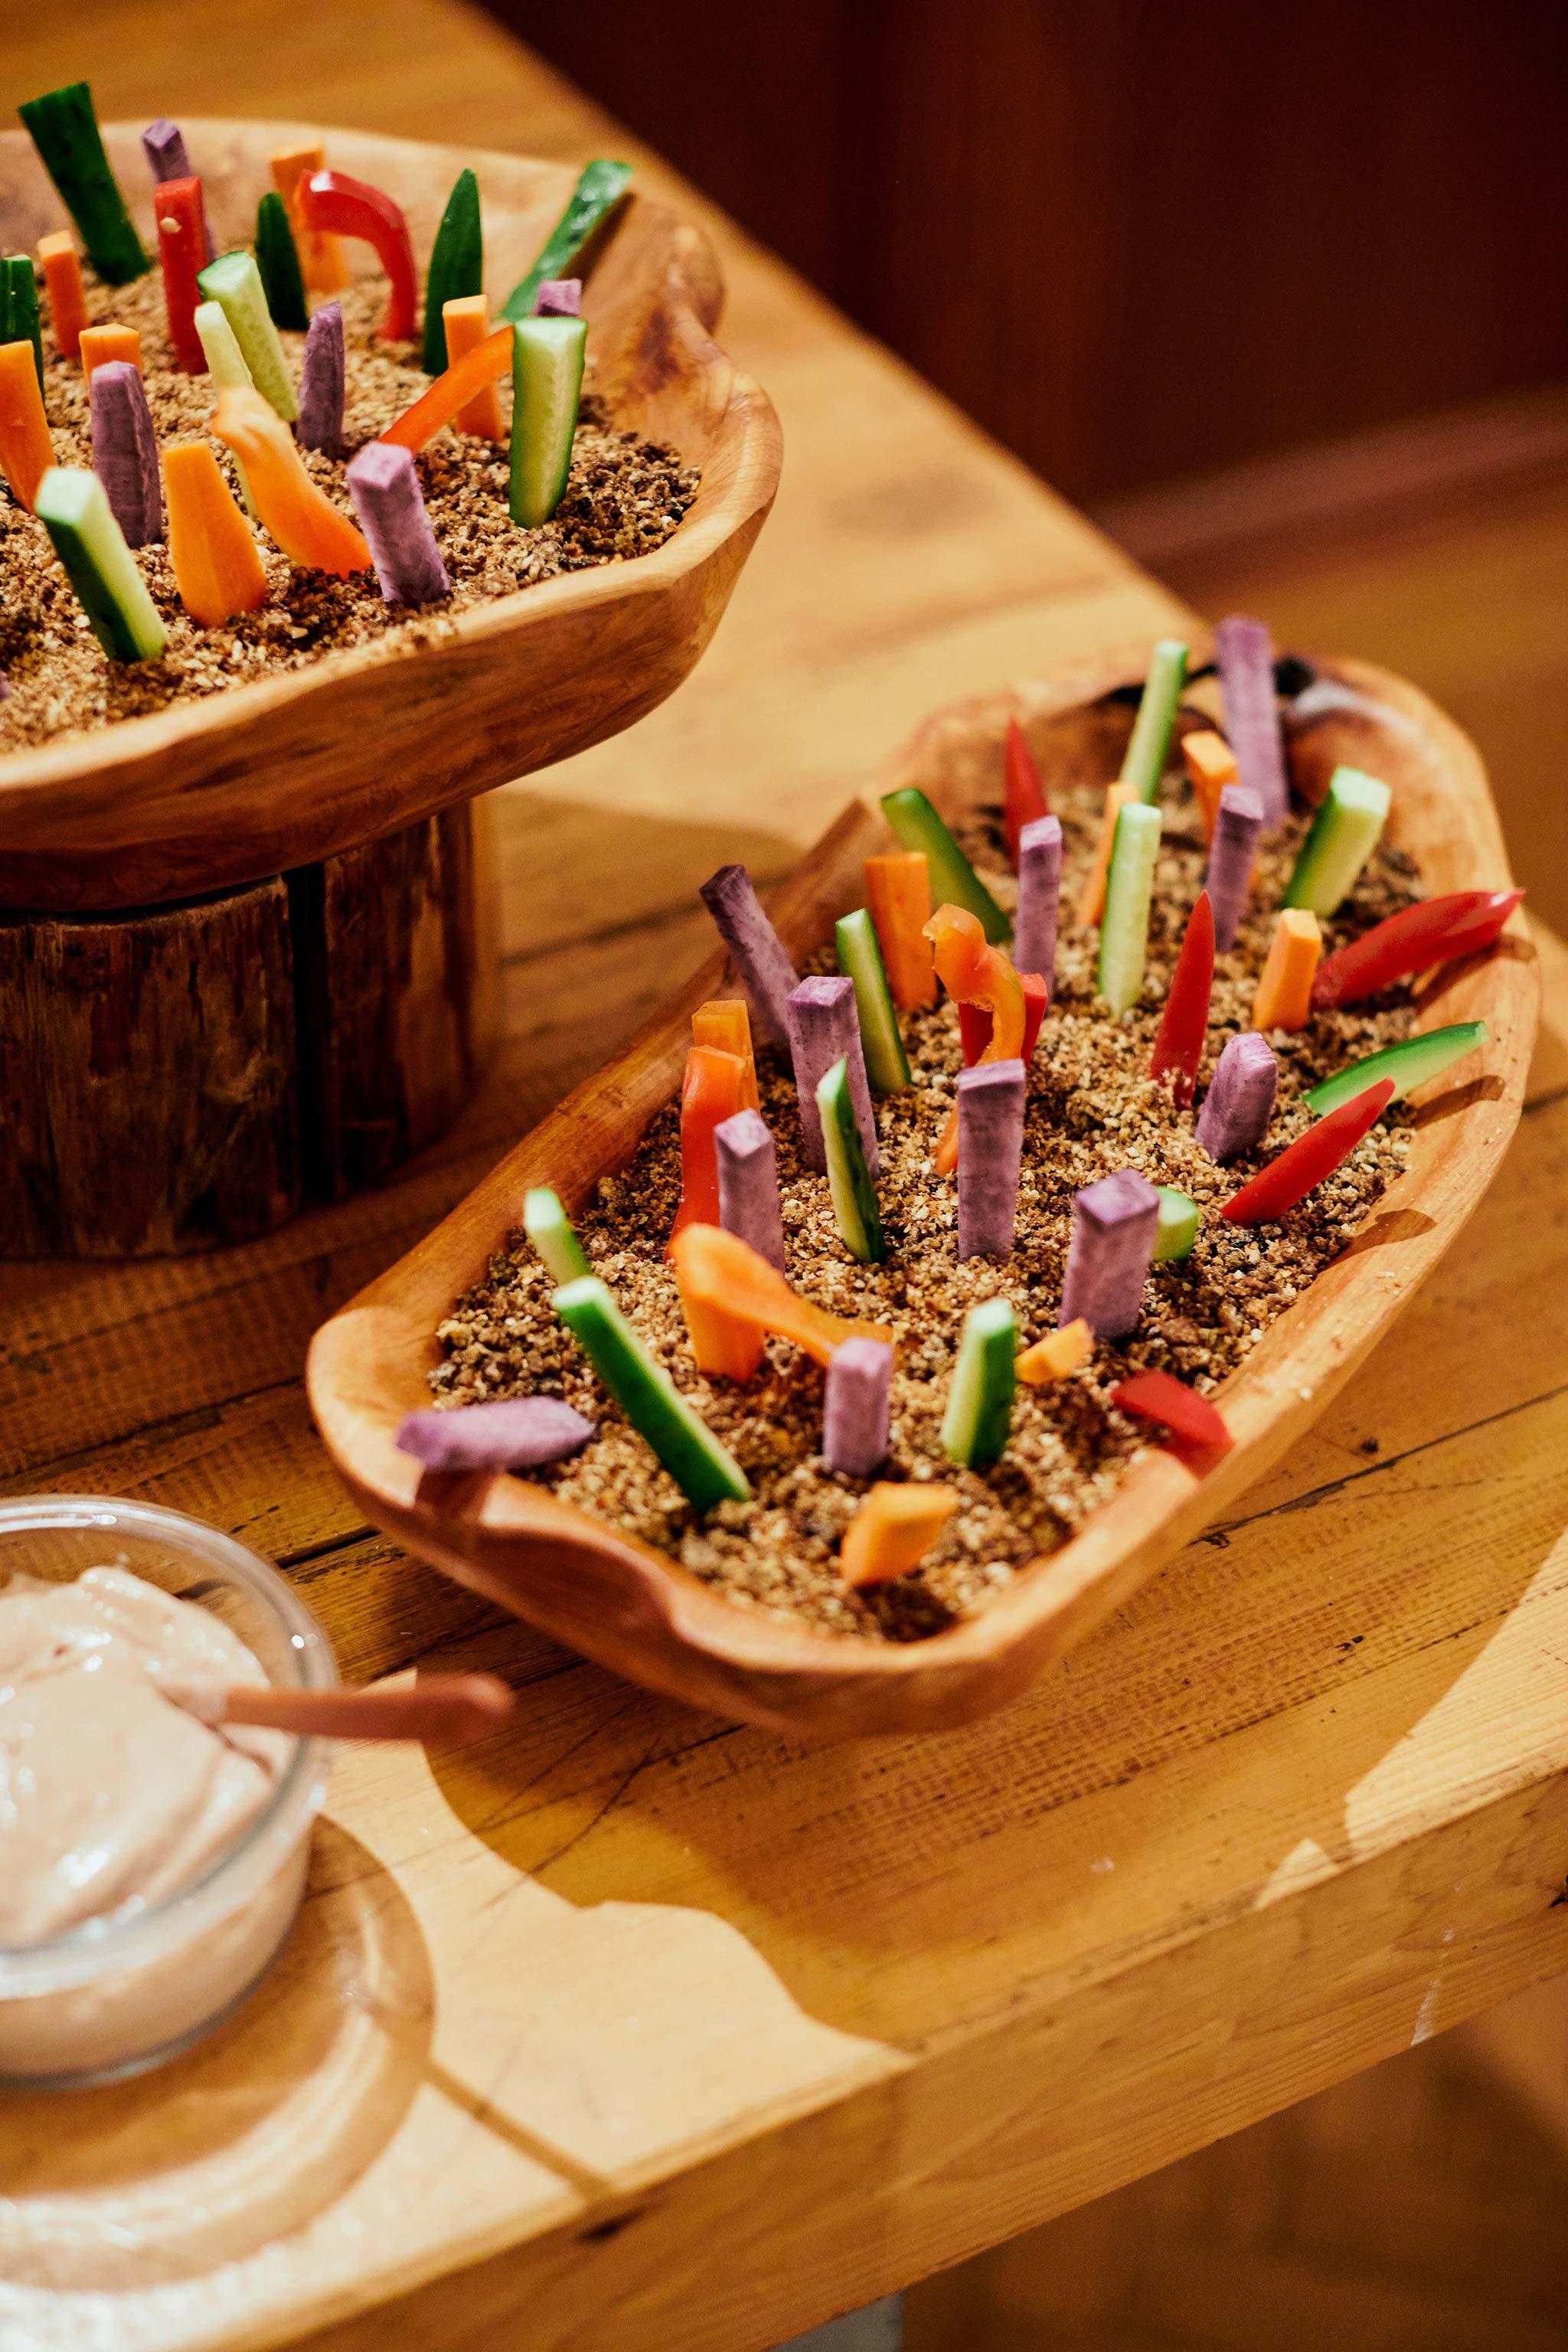 tokyo asakusa shrine bears table reception salad bar